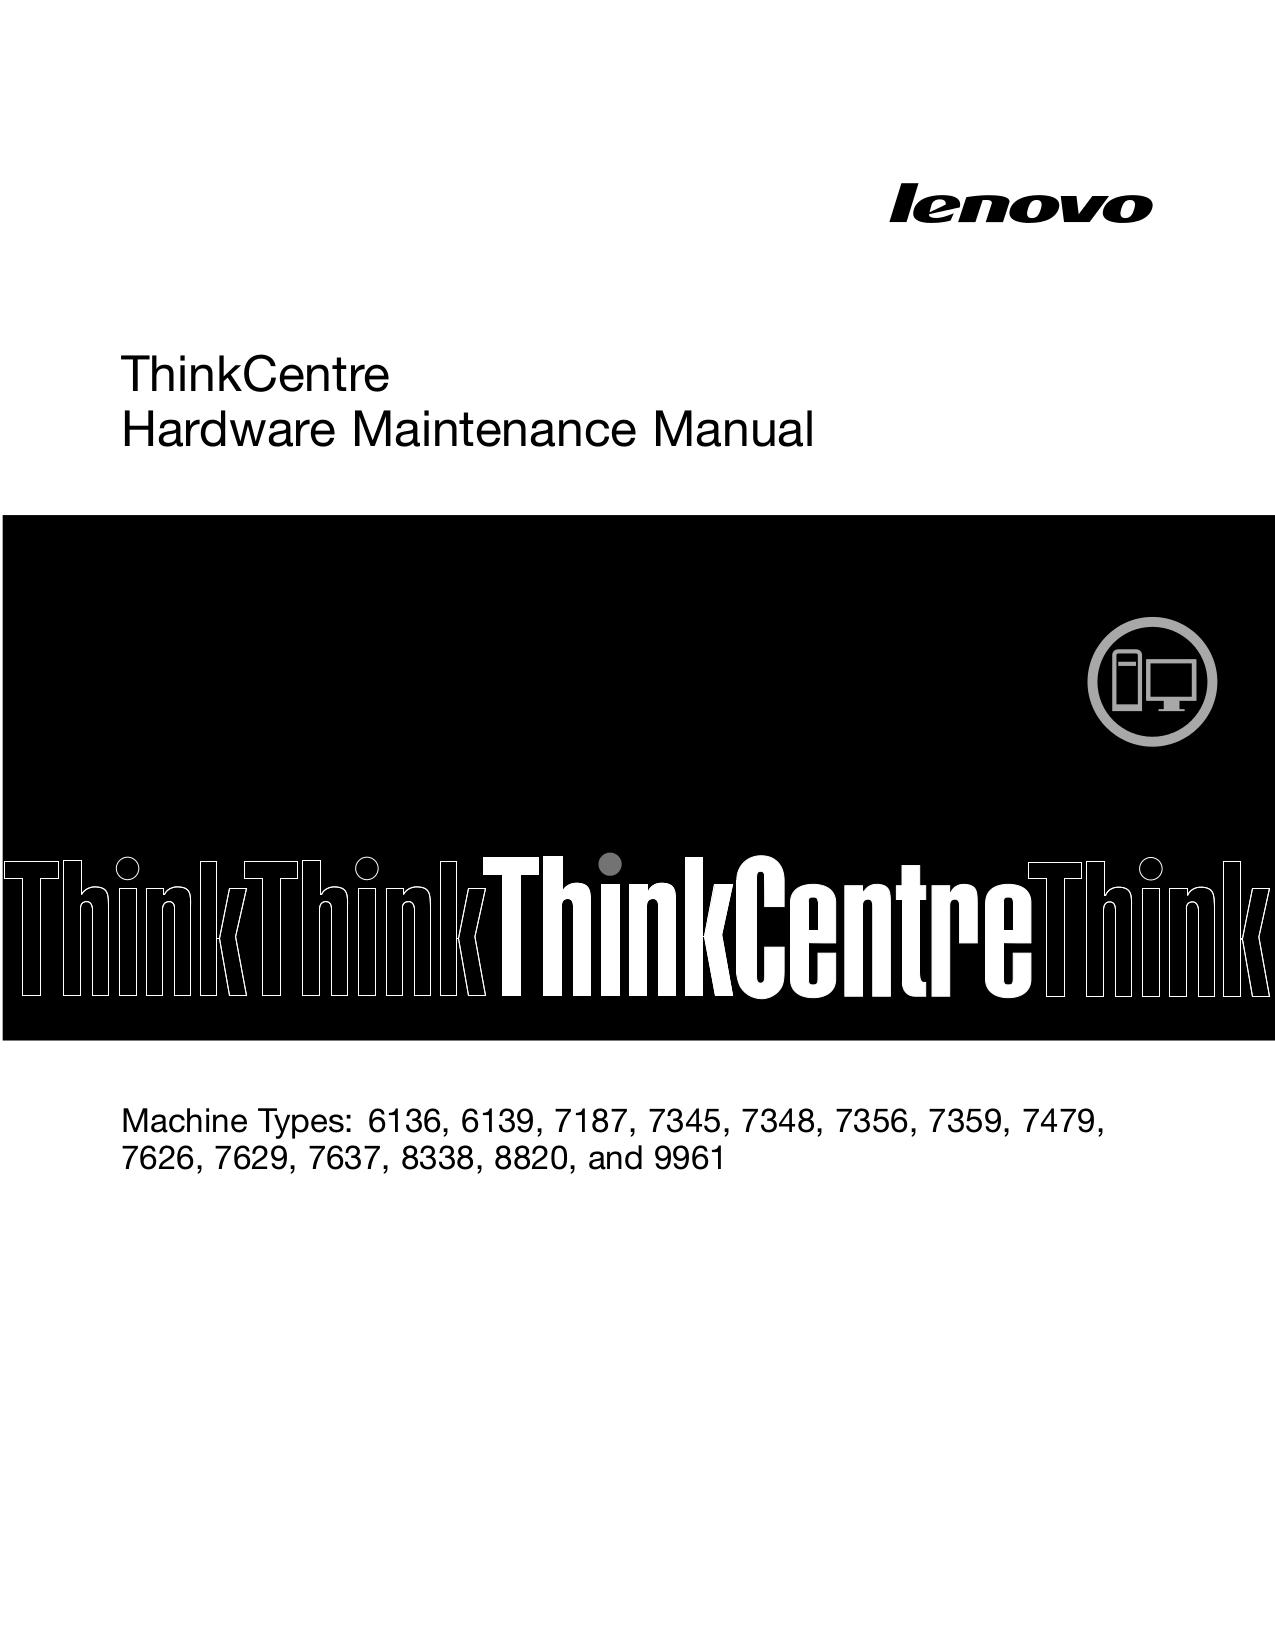 pdf for Lenovo Desktop ThinkCentre M58 7359 manual